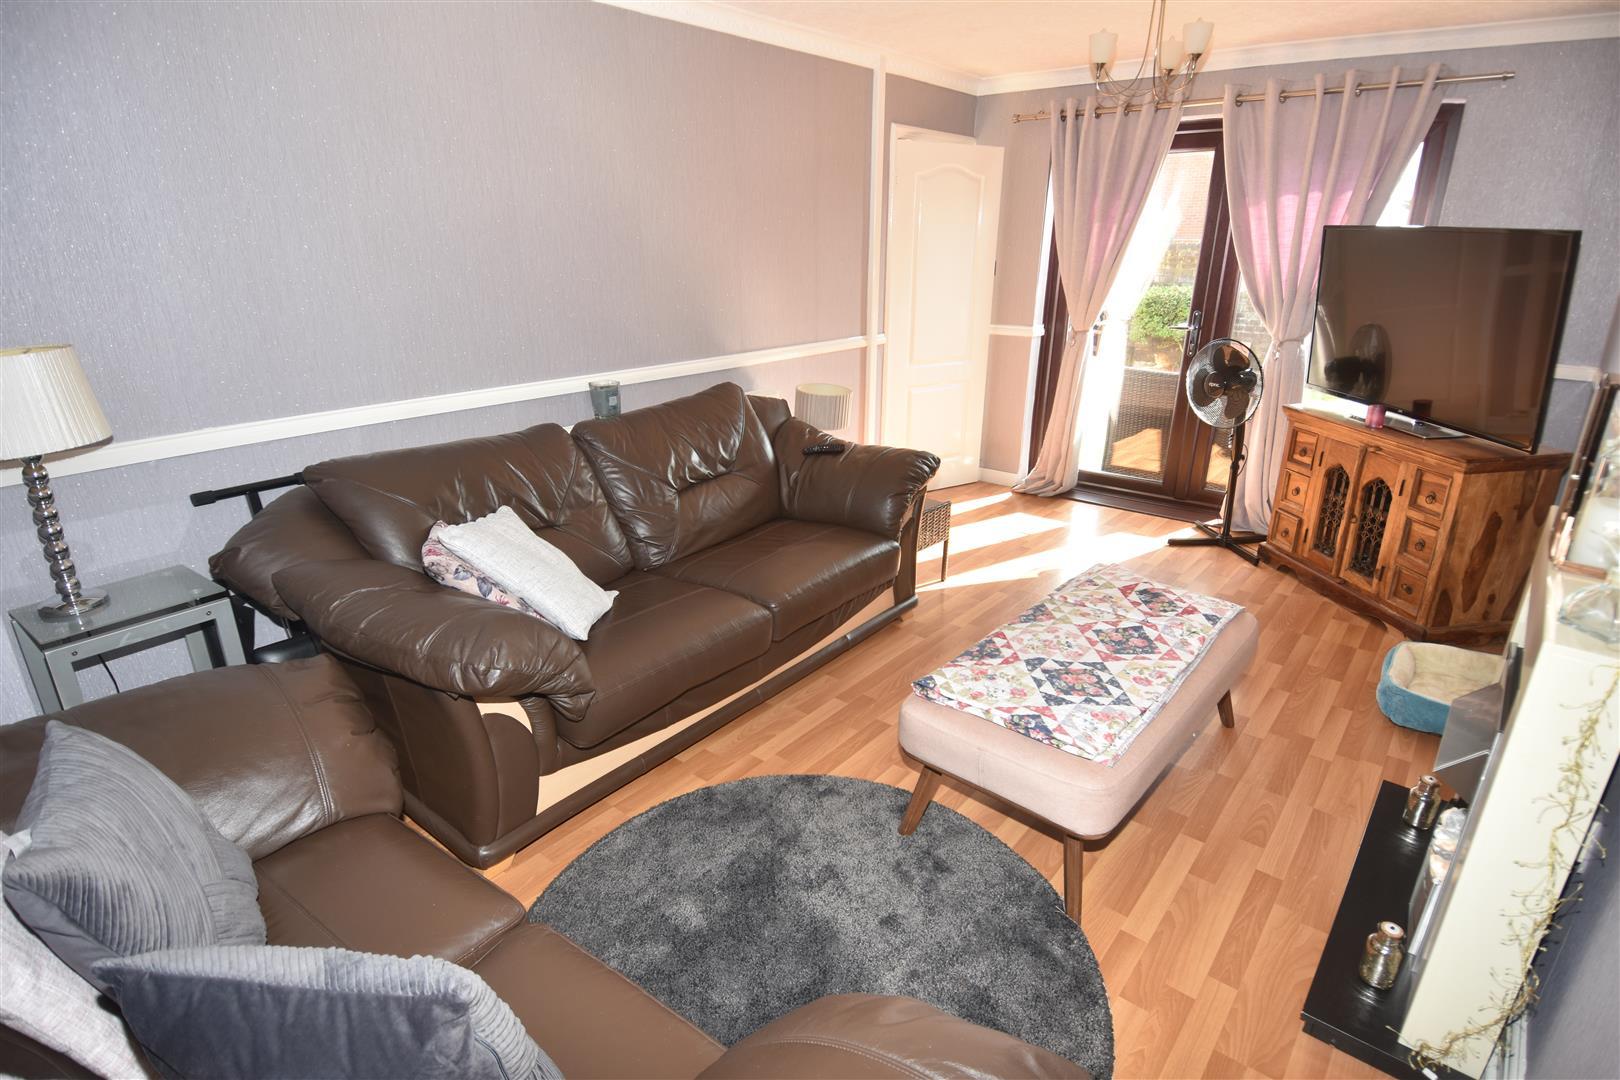 3 bed house for sale in Asholme Close, Bromford Bridge, Birmingham 4